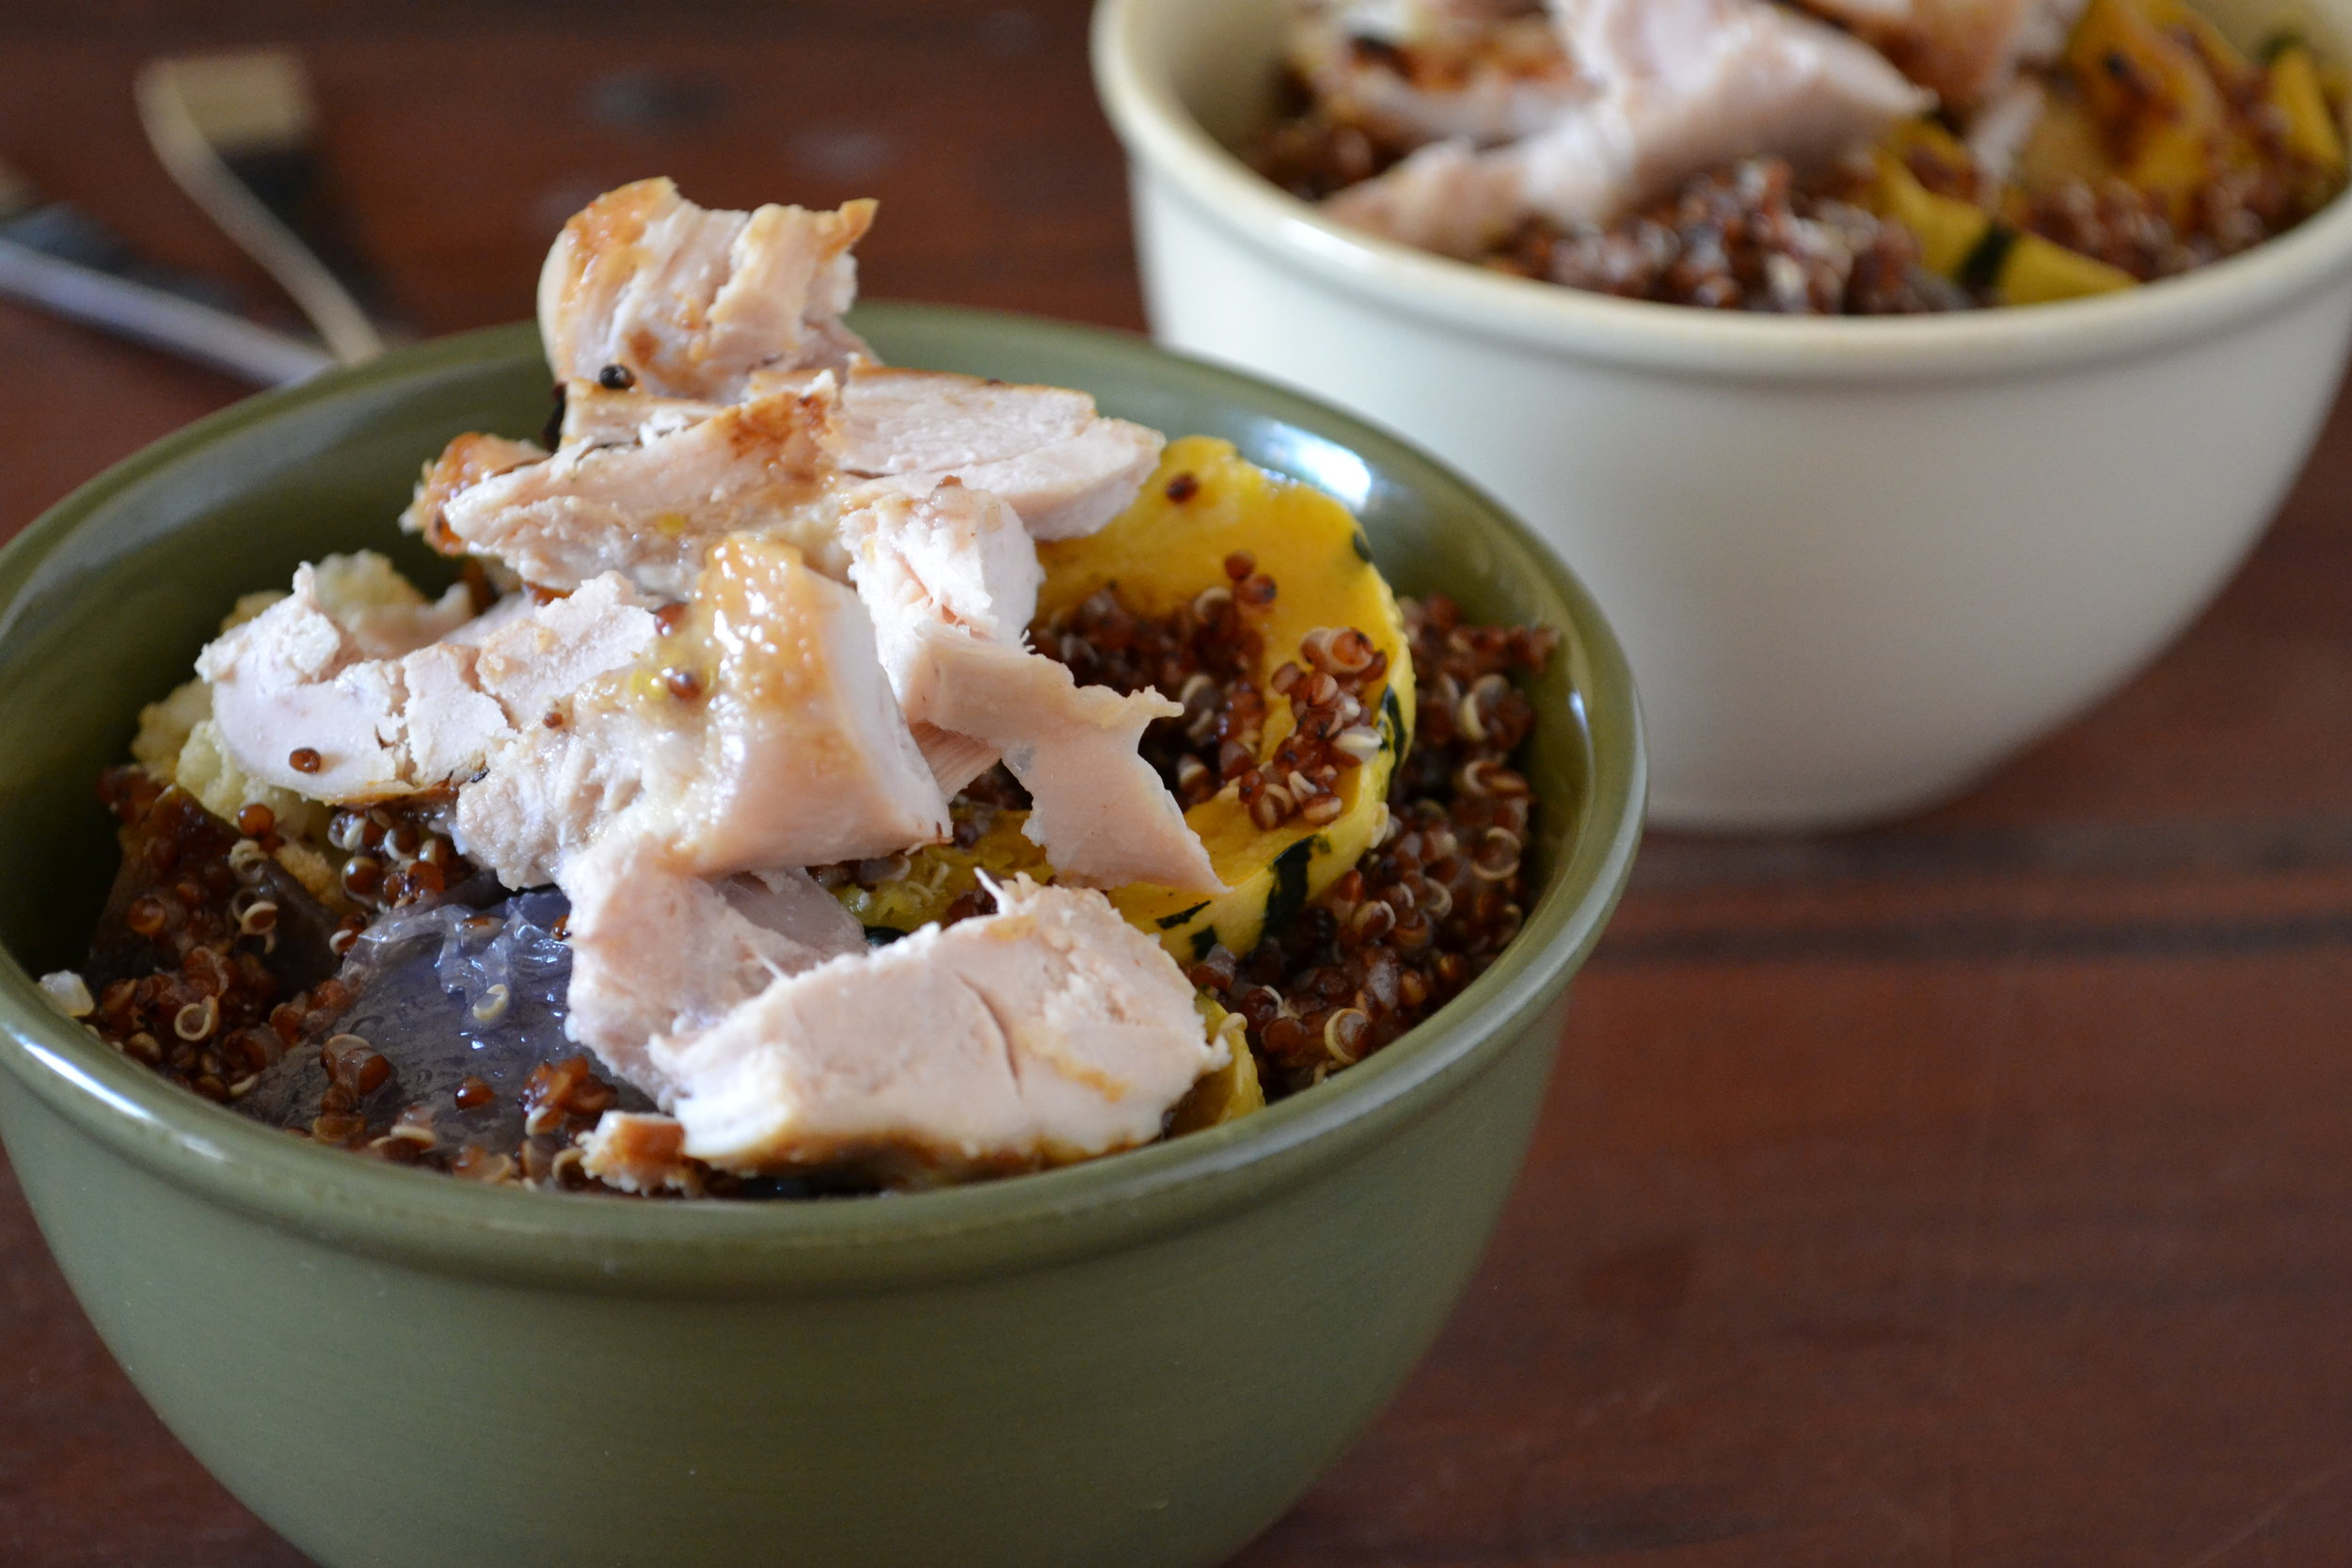 a bowl of red quinoa & veggies